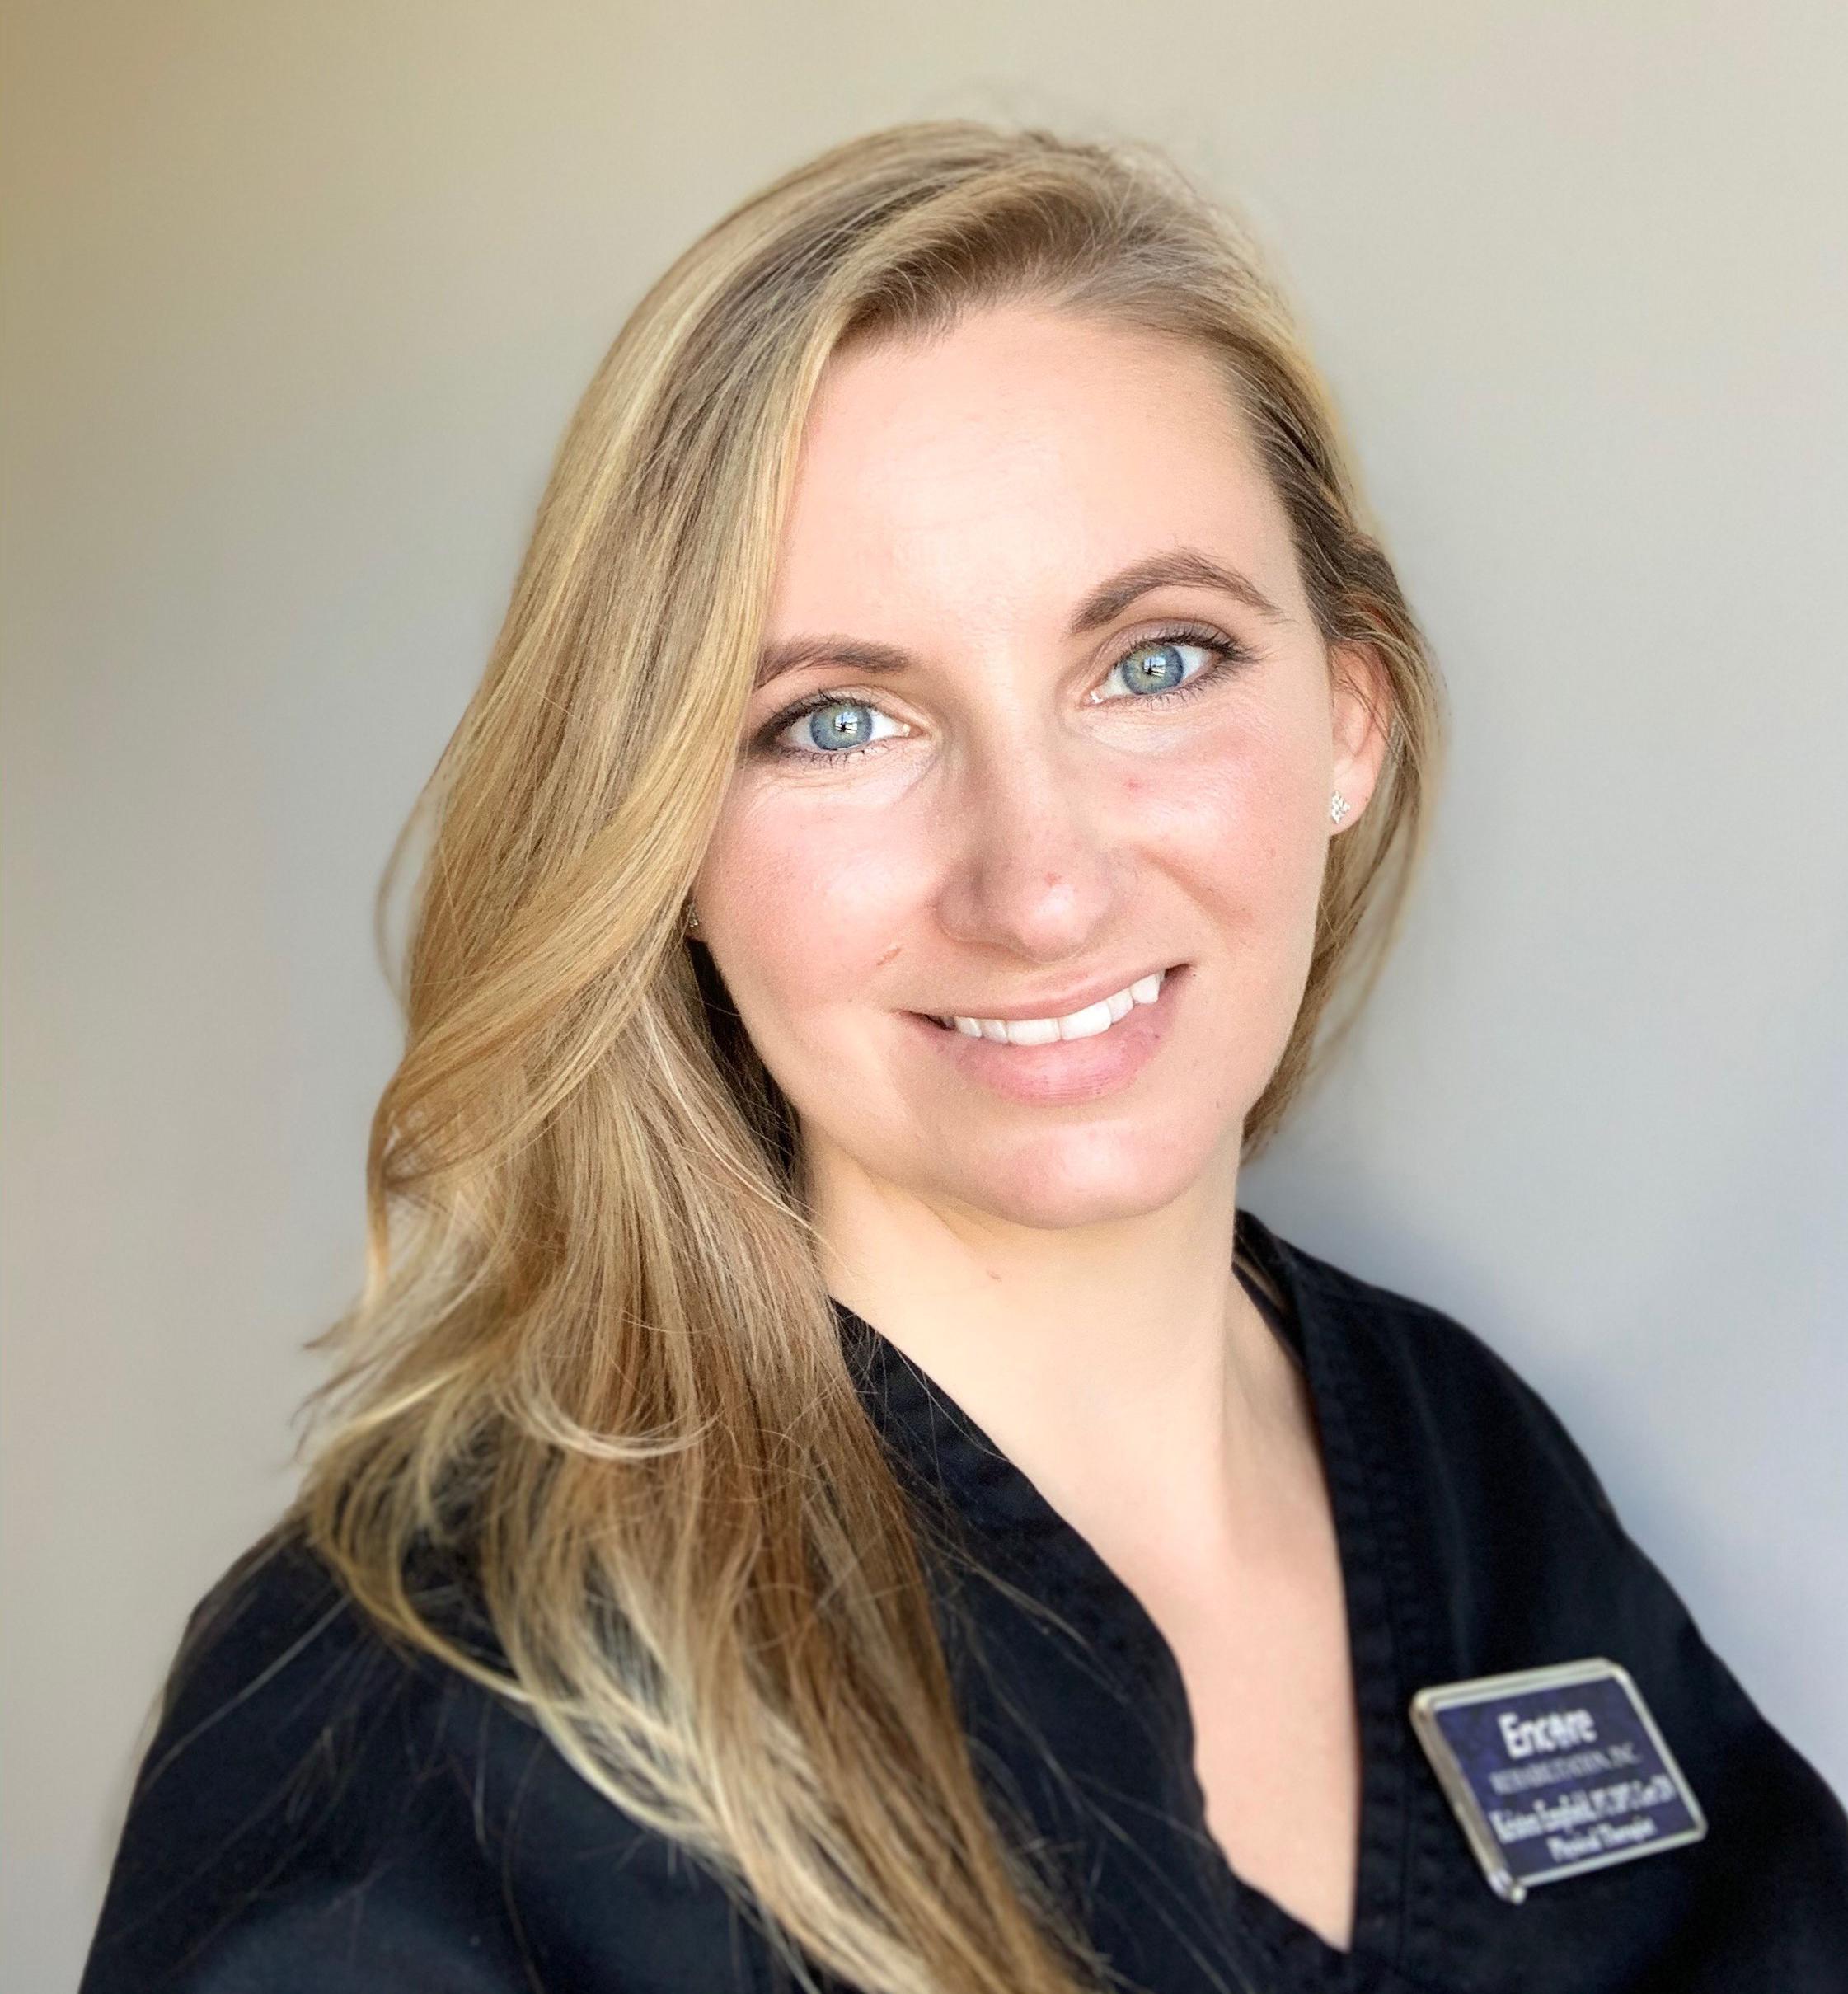 Kristen Empfield, DPT, Clinic Director at #EncoreRehab Bay Minette